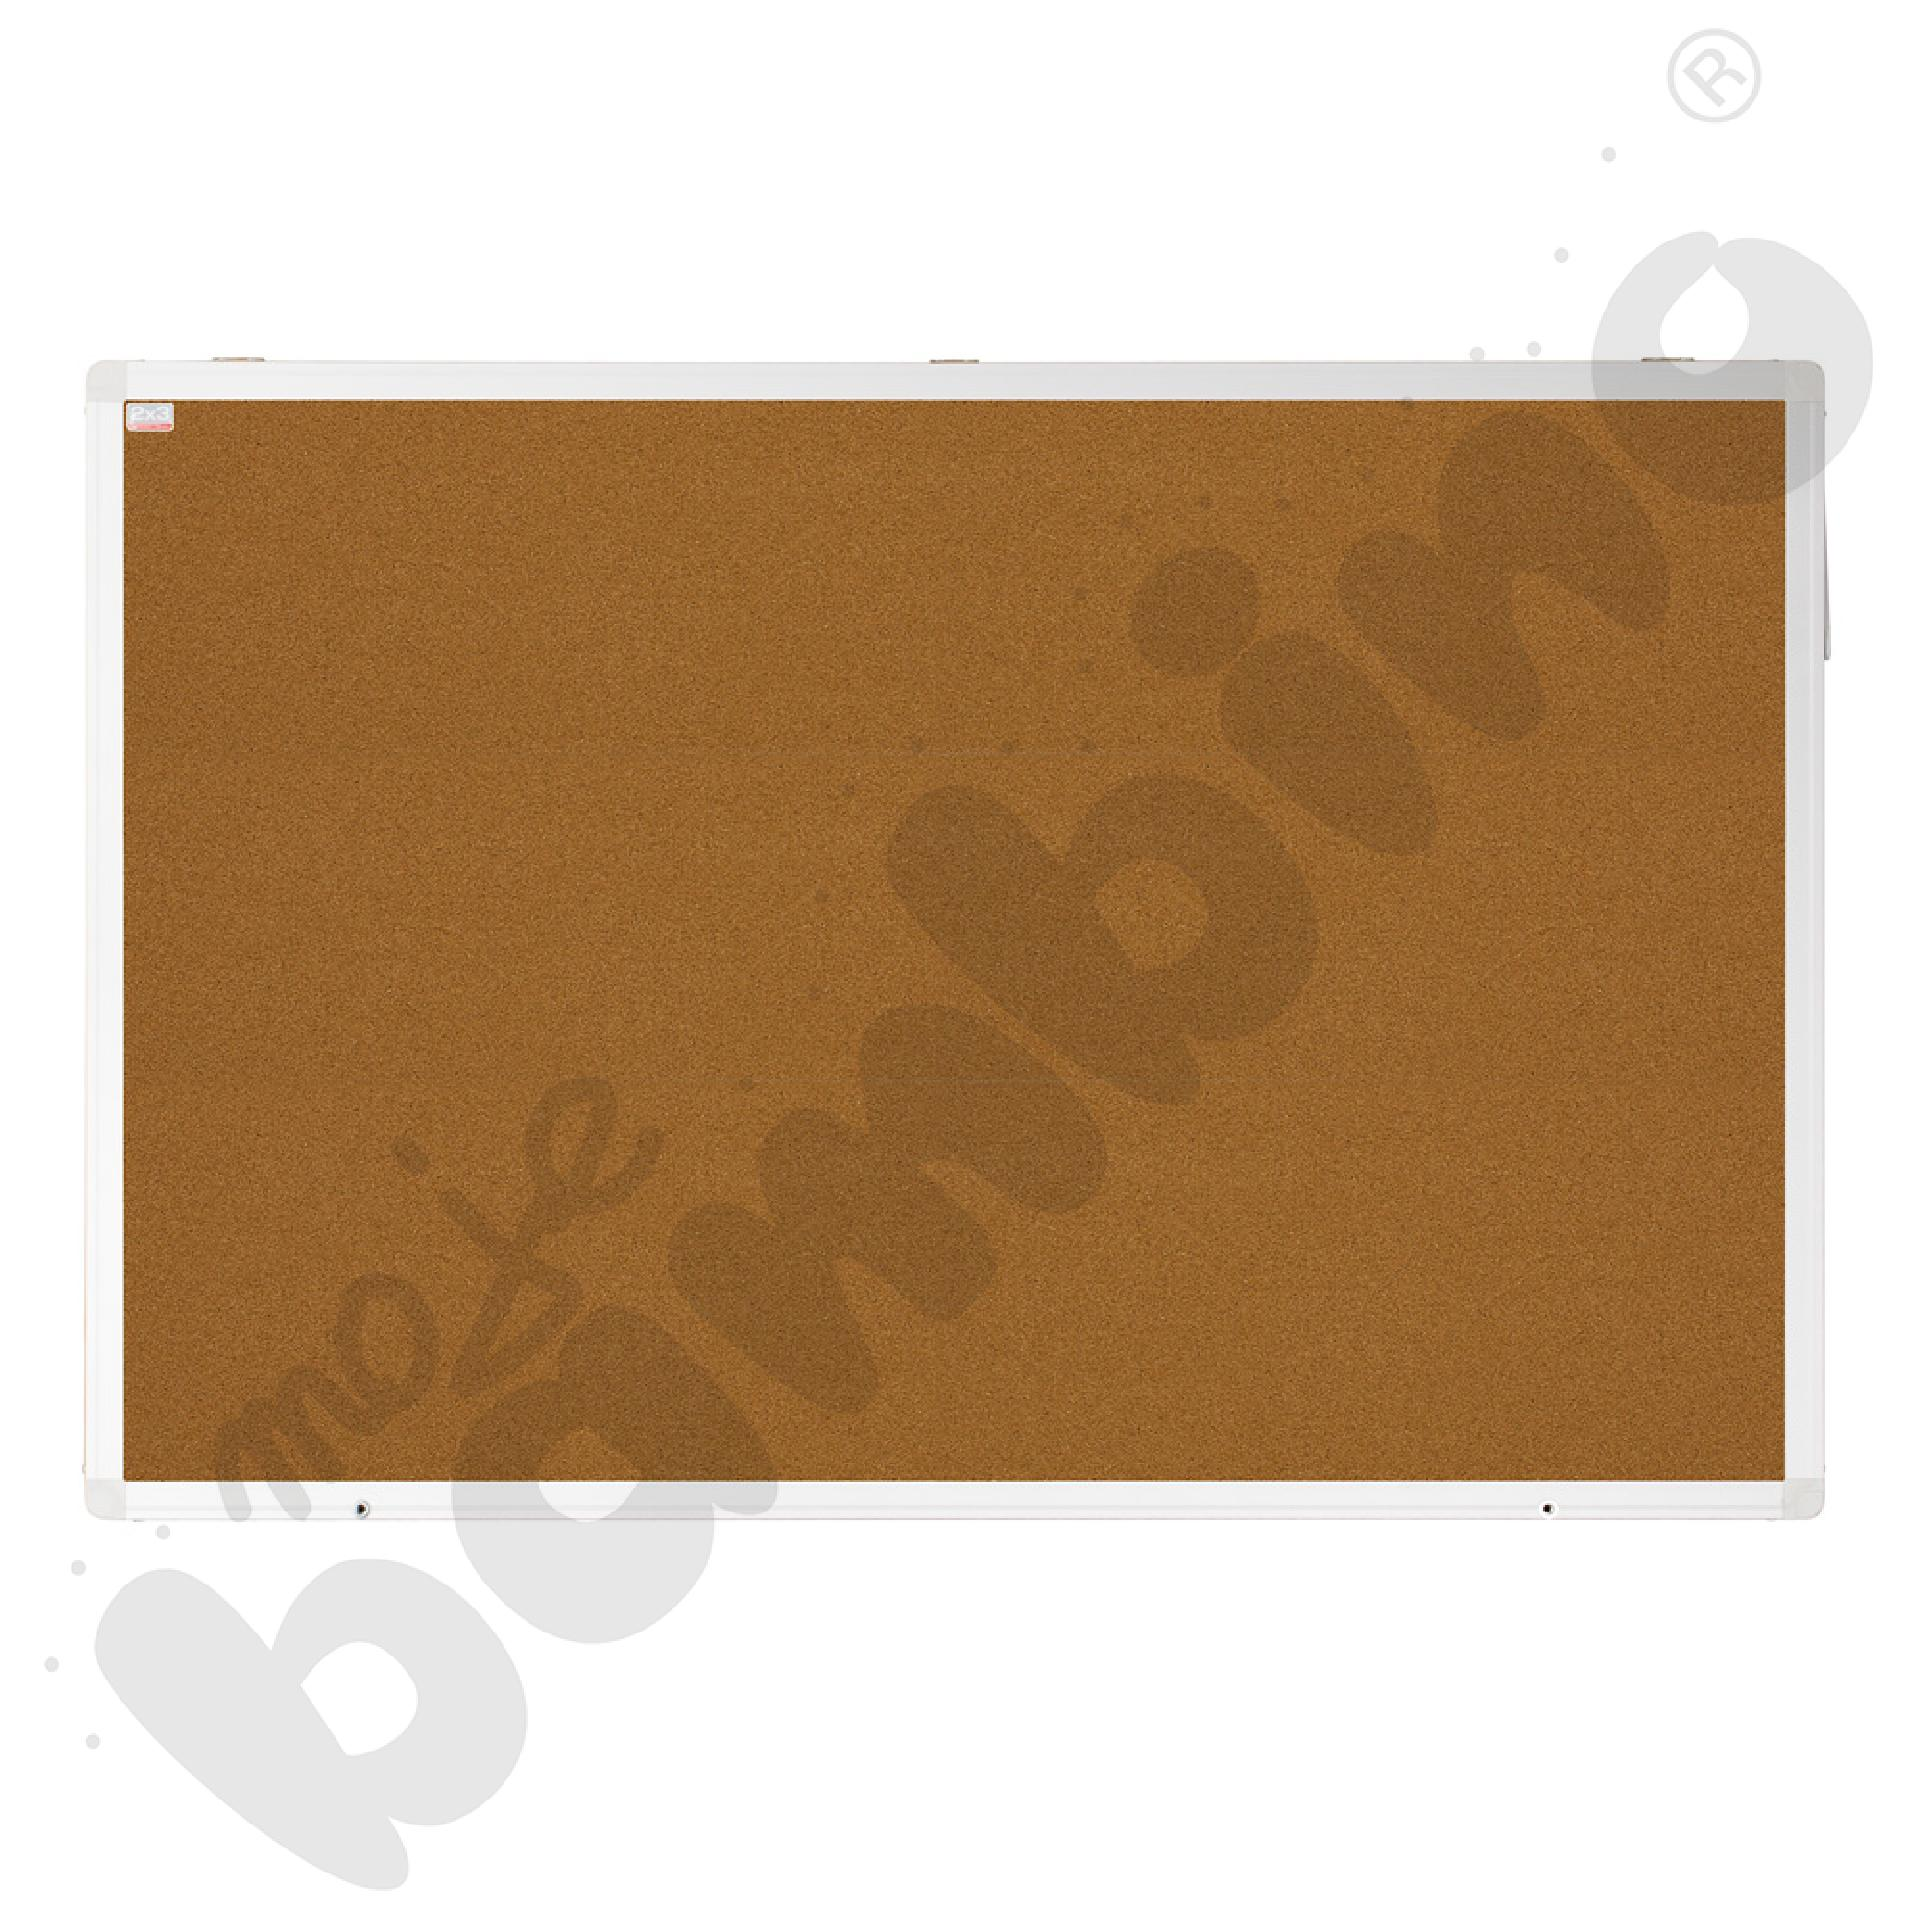 Gablota korkowa 90 x 60 cm